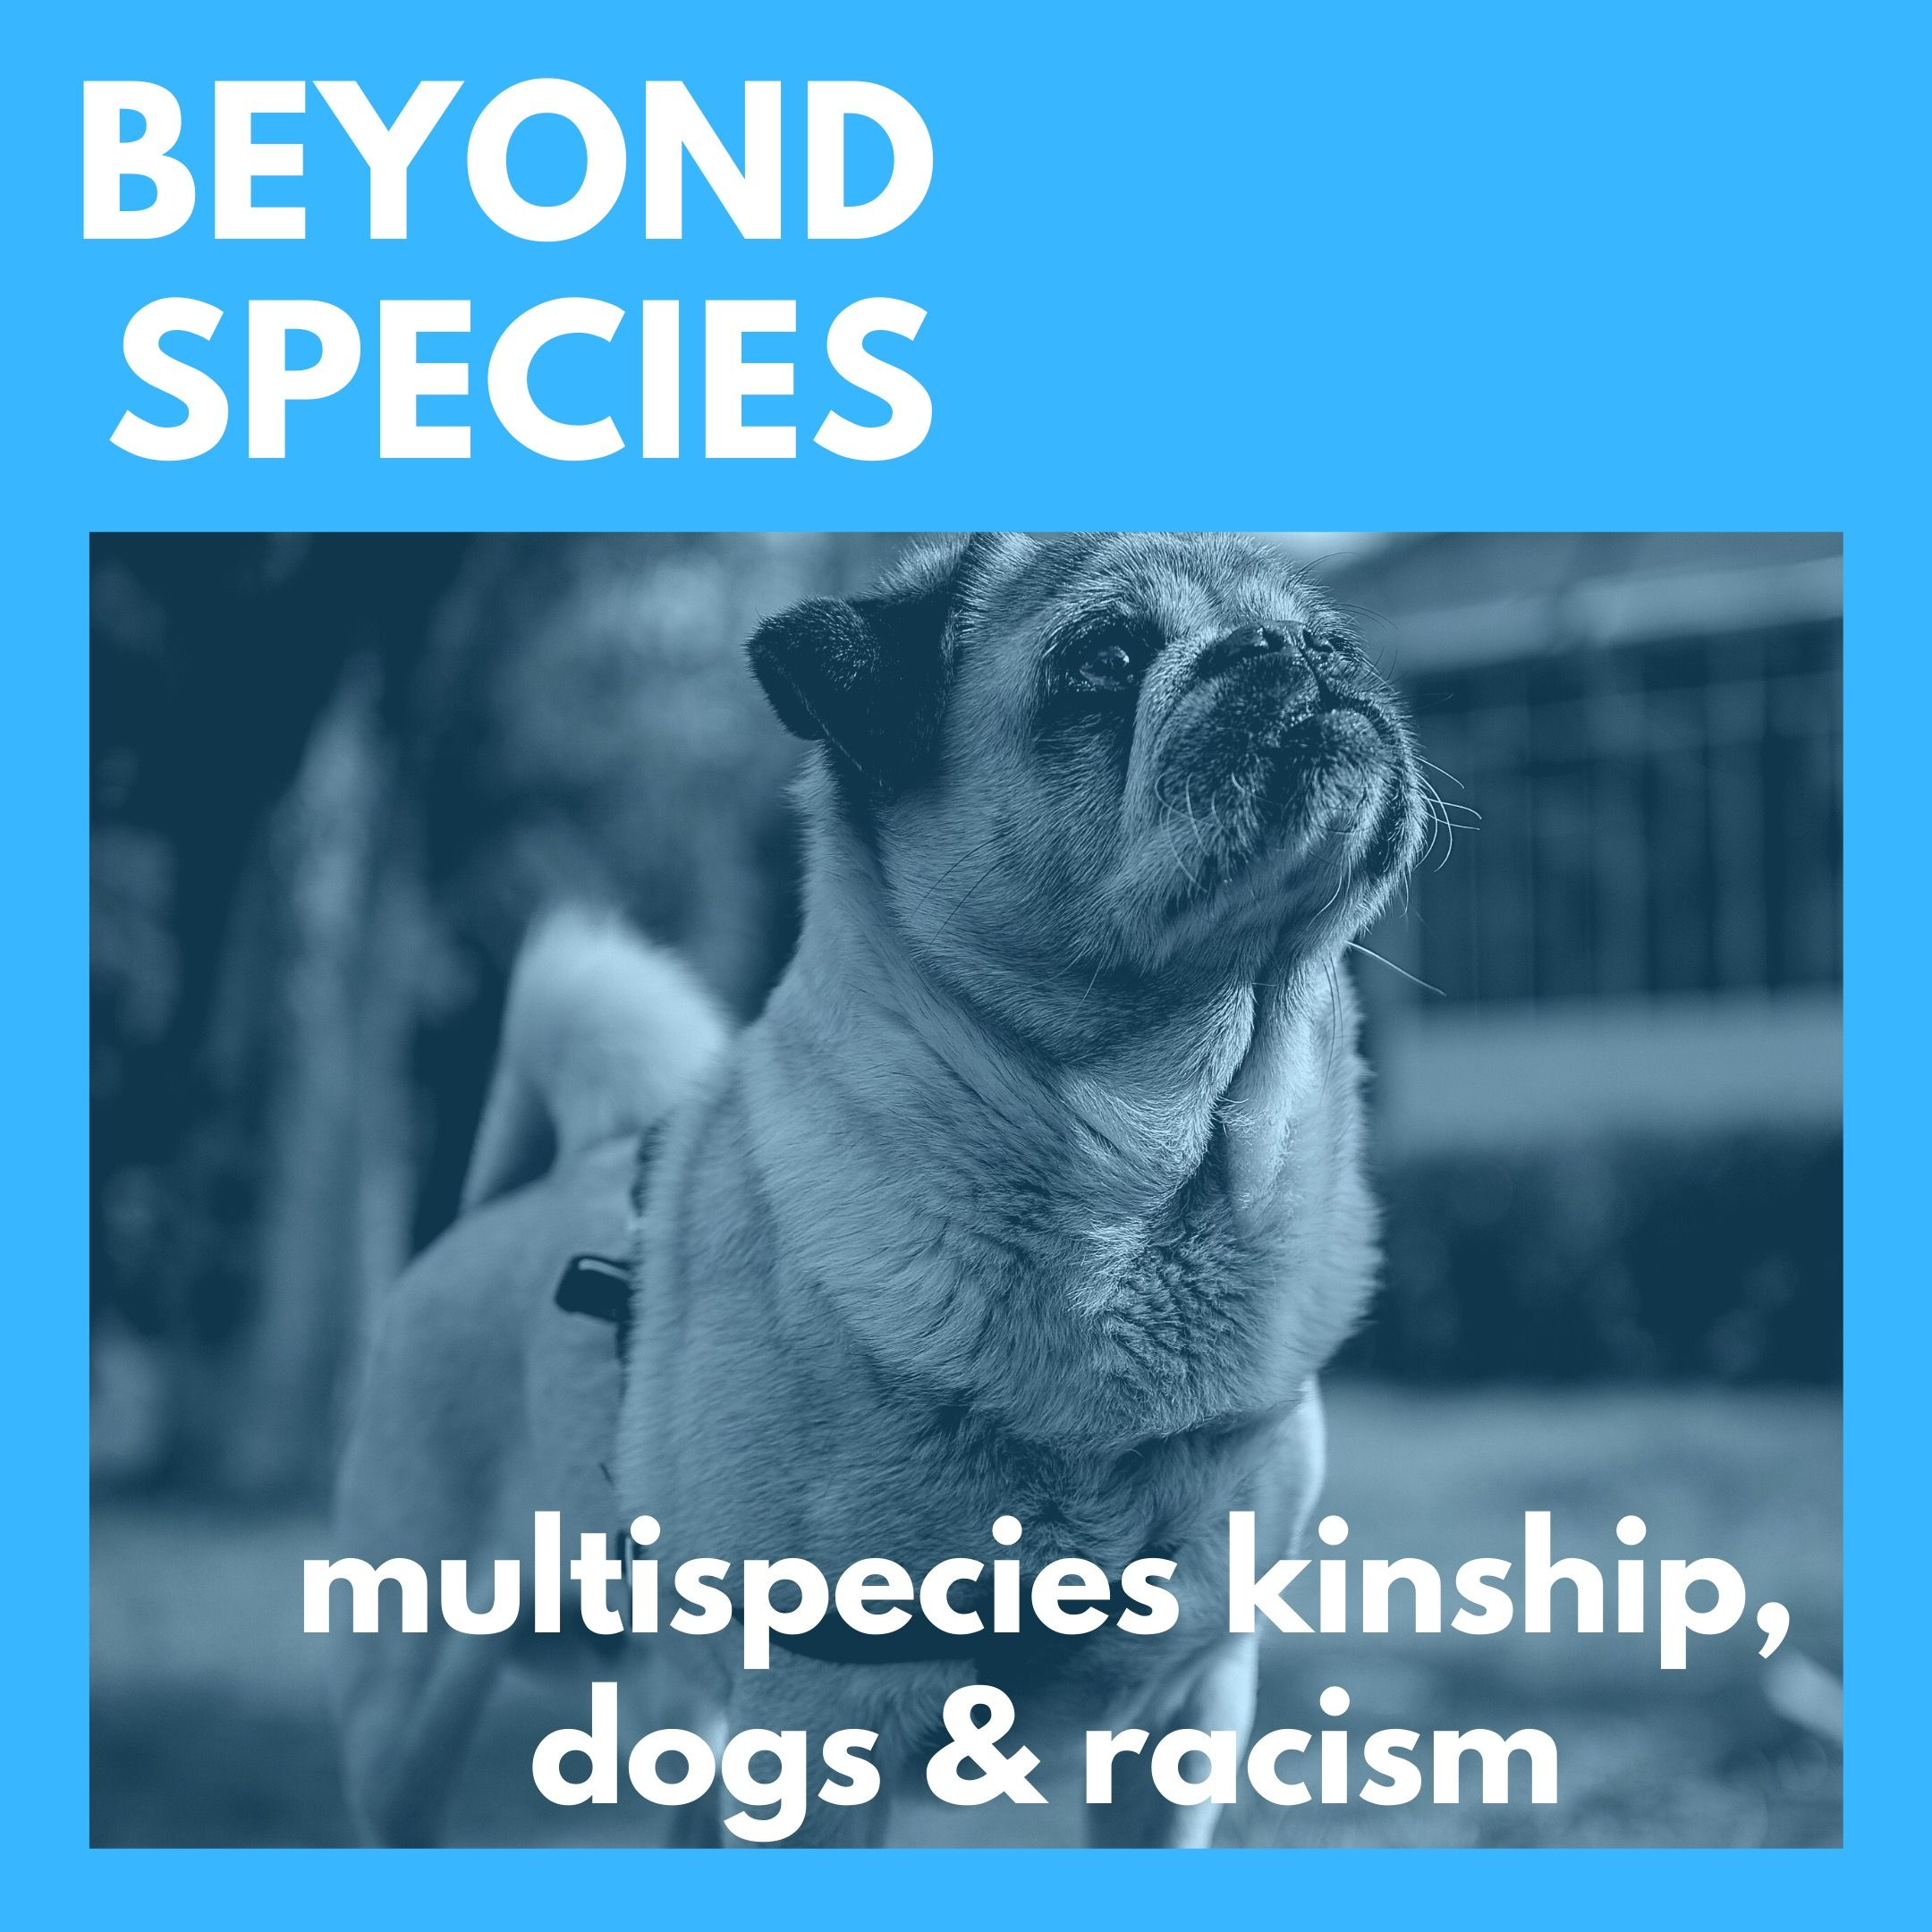 Multispecies Kinship, Dogs & Racism